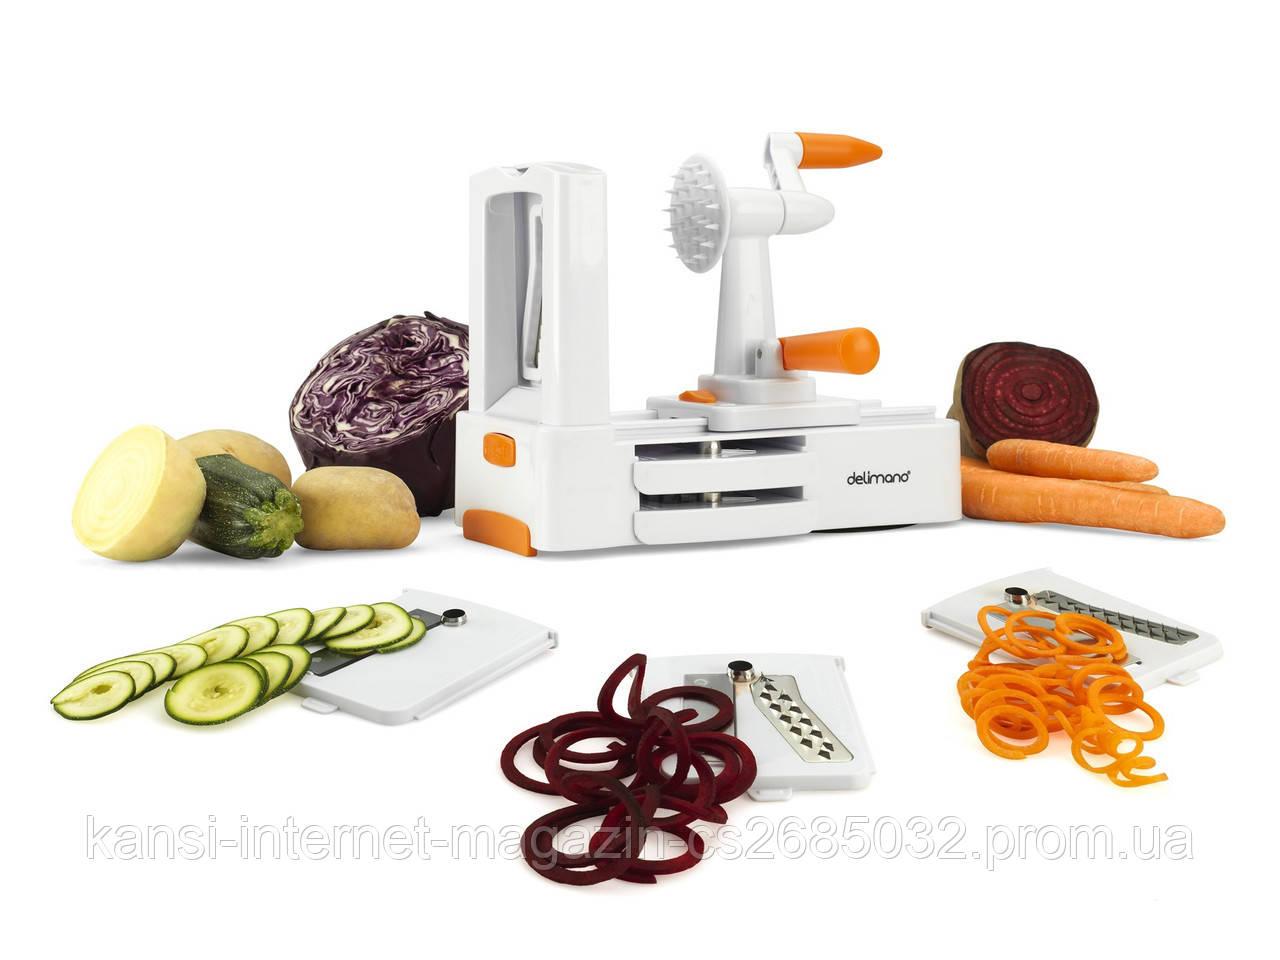 Спиральная овощерезка Special vegetable slicer, мультислайсер, тёрка